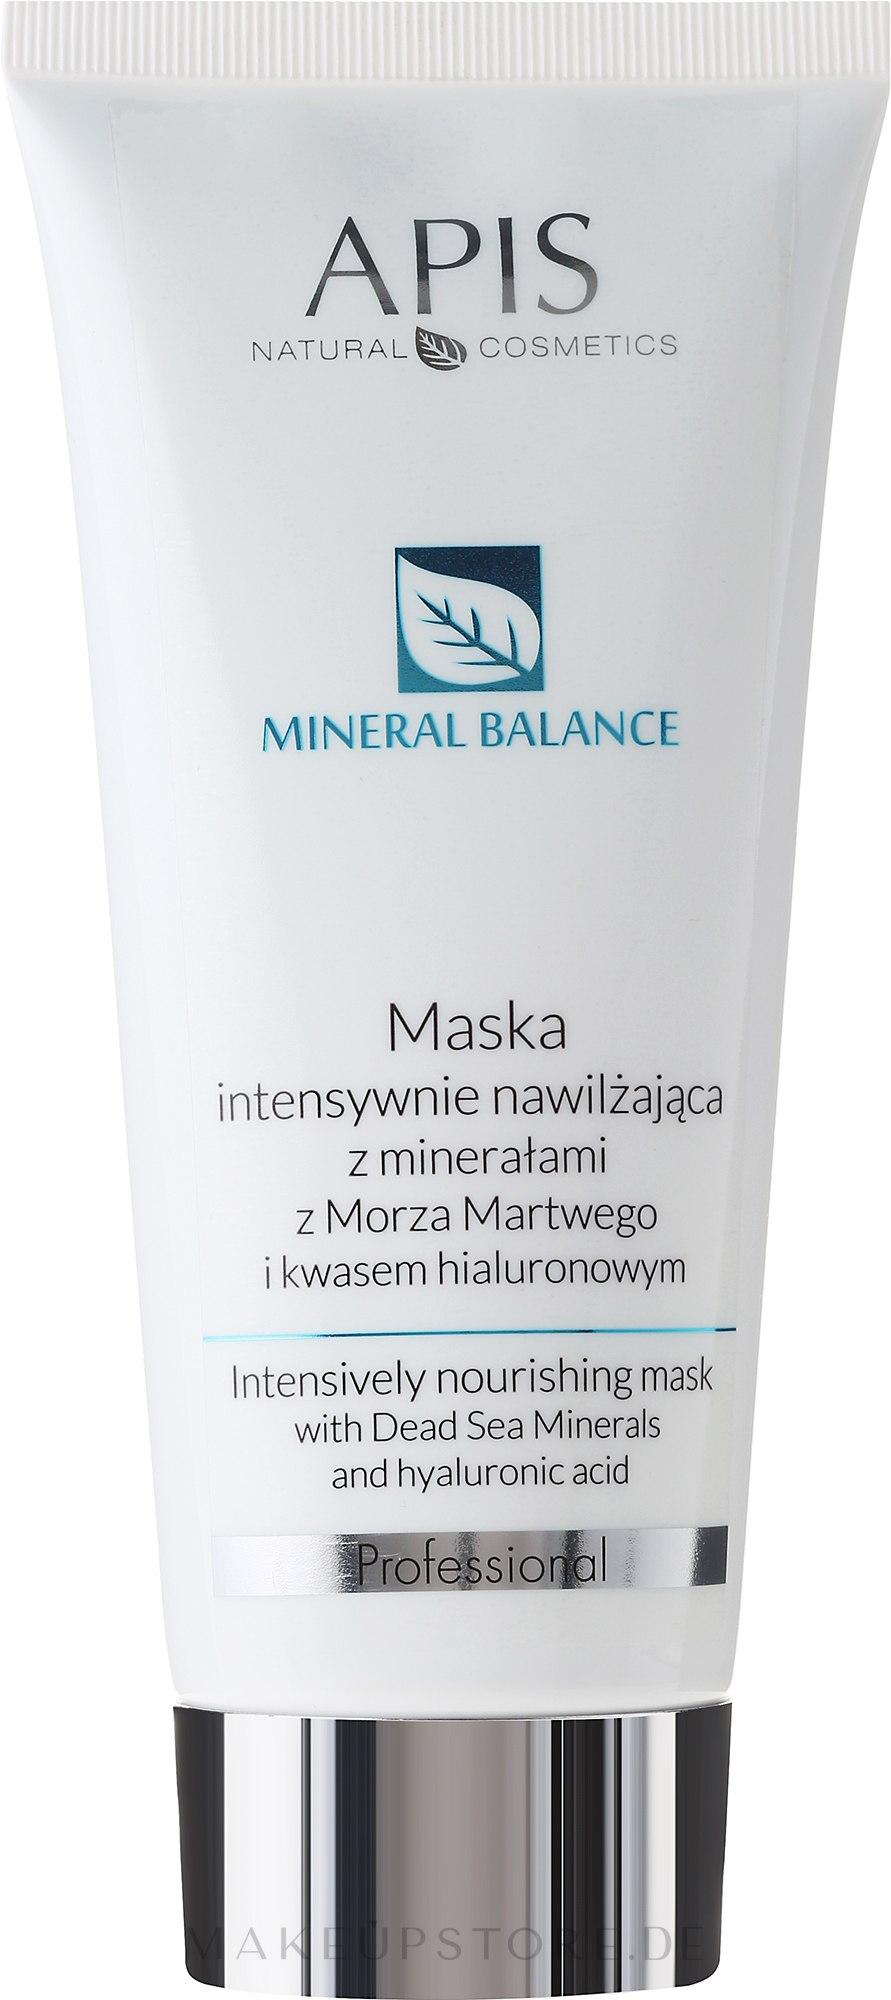 Intensiv pflegende Gesichtsmaske mit Mineralien aus dem Toten Meer - APIS Professional Hydro Balance Intensively Nourishing Mask — Bild 200 ml